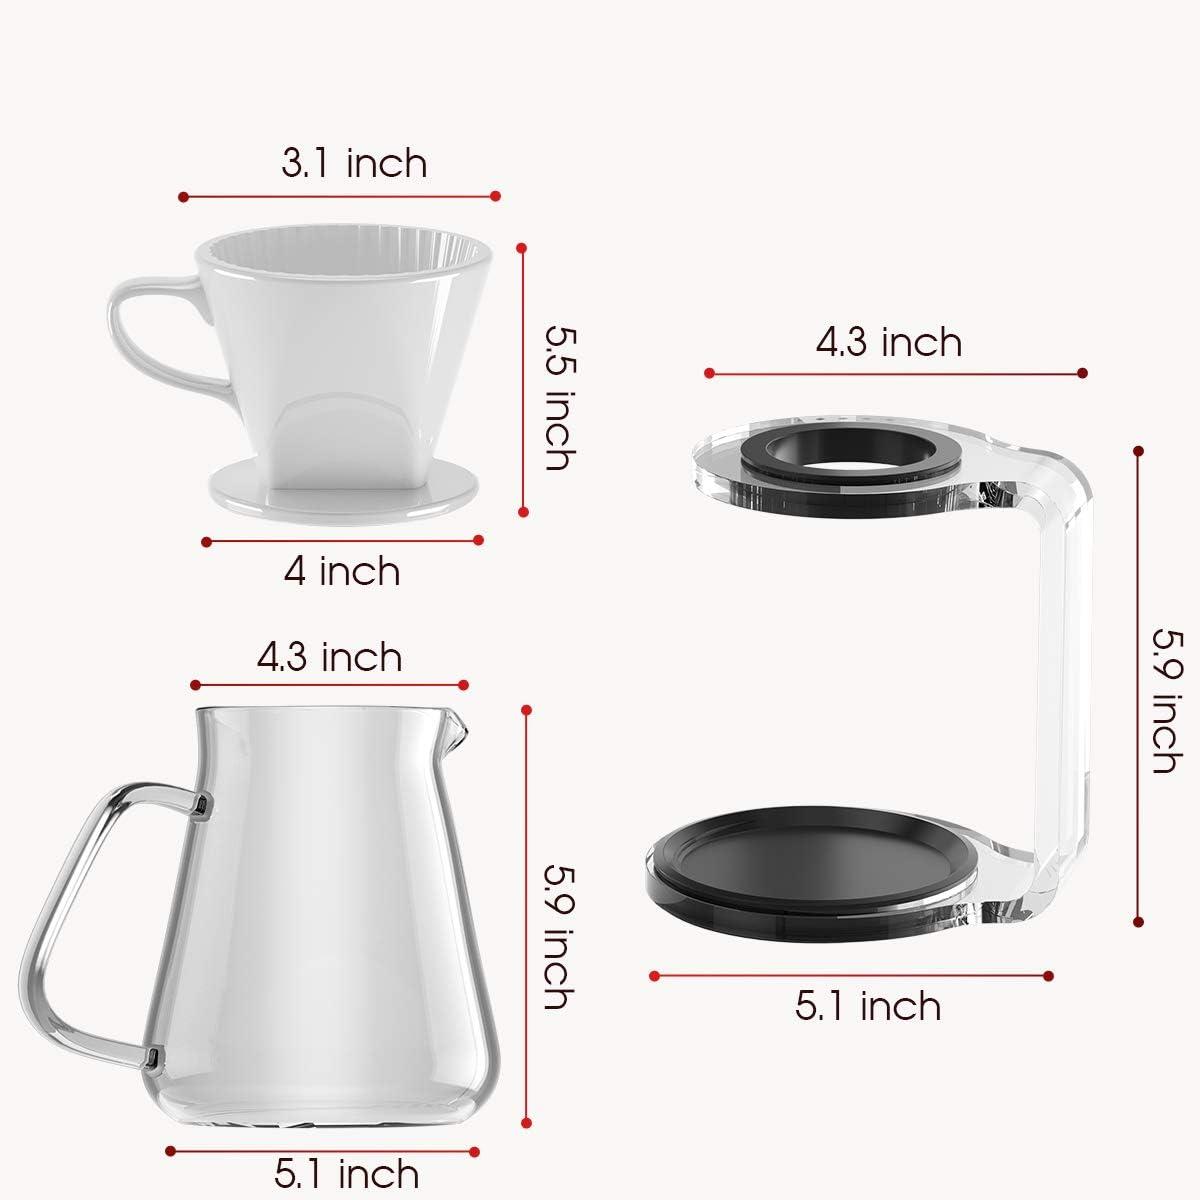 Coffee Makers Coffee, Tea & Espresso Appliances ghdonat.com White ...